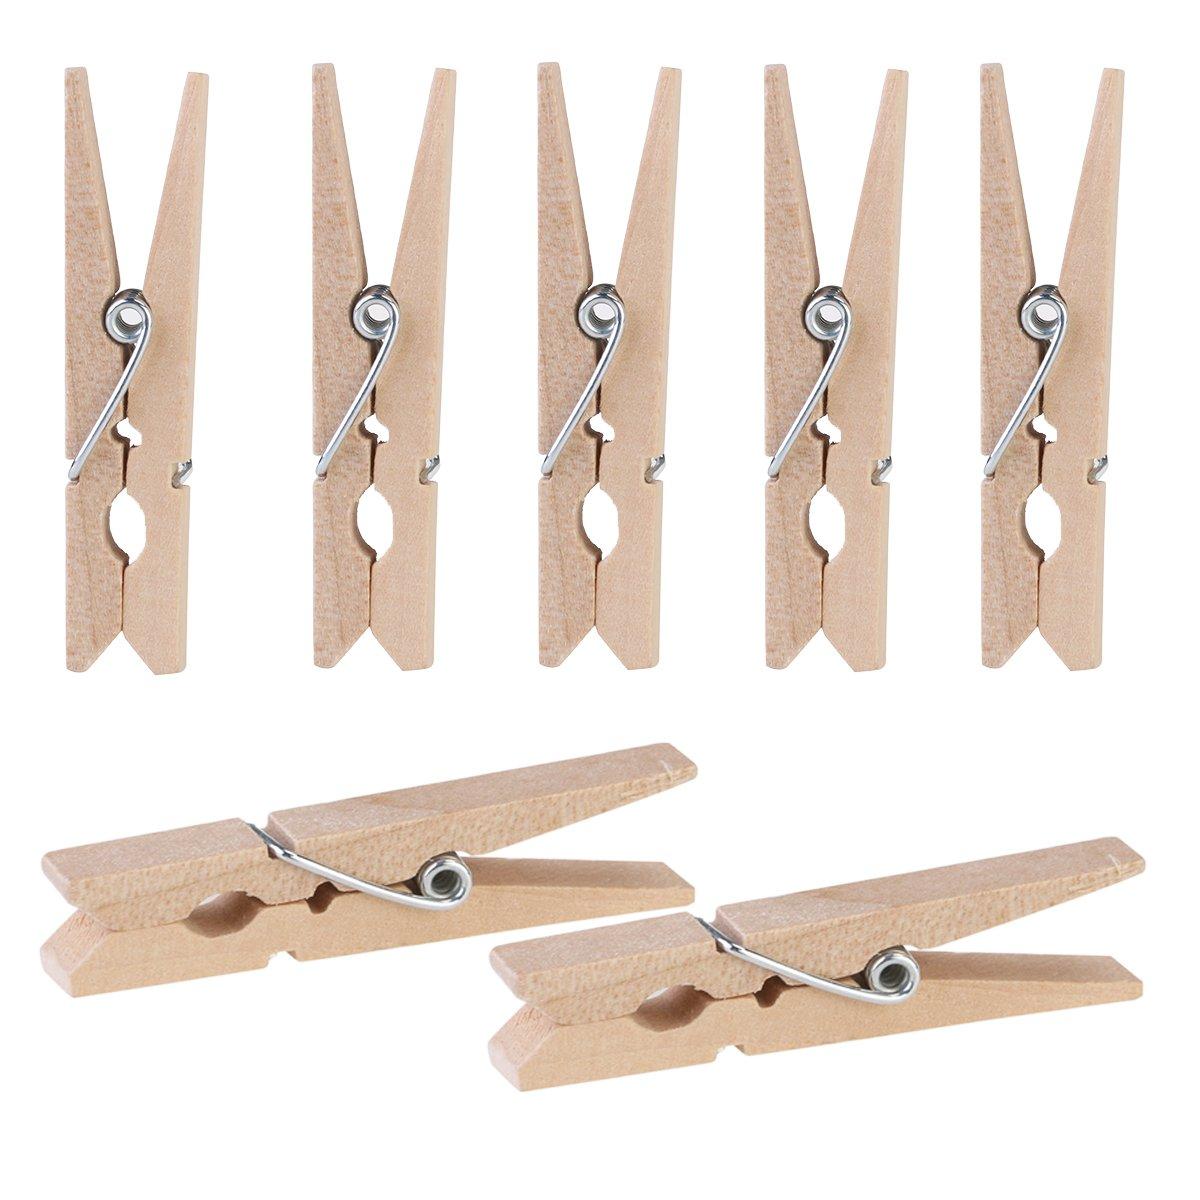 UKCOCO 100 Pcs 4.8CM Wooden Pegs Clothespins Mini Decorative Clip Wood Craft Photo Clip